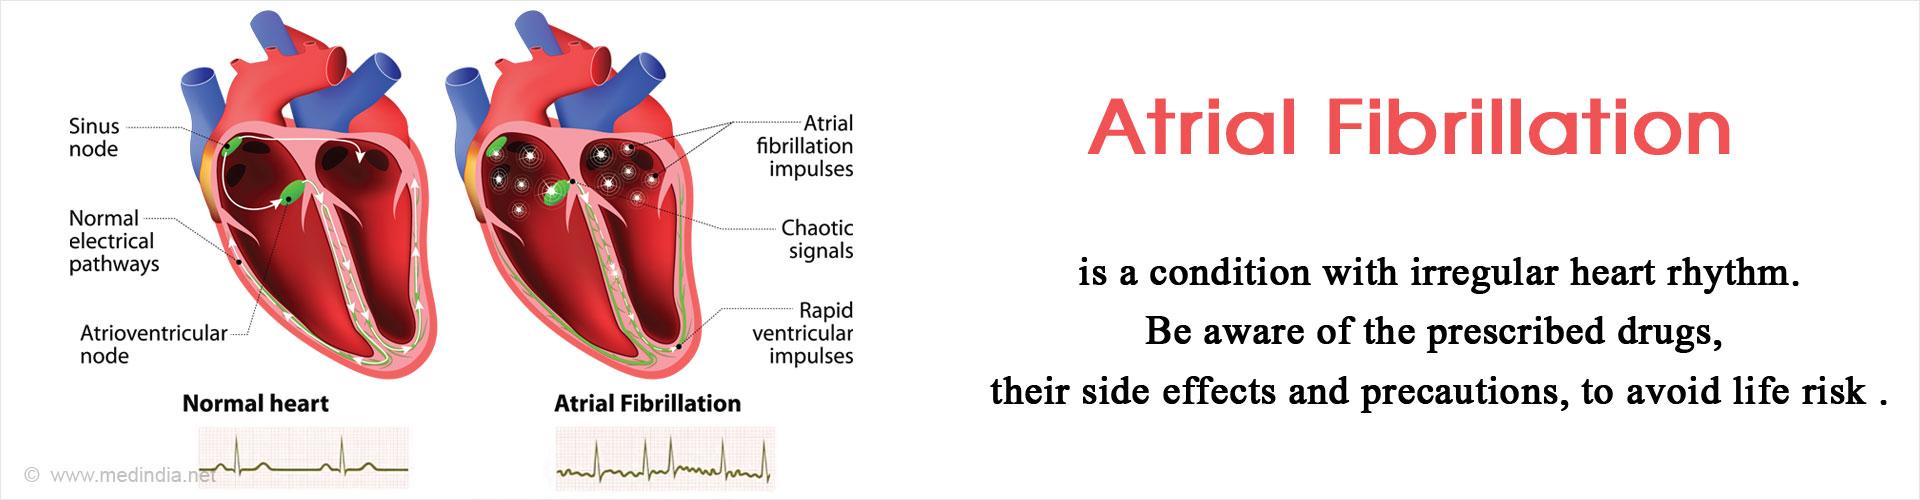 Drugs for Atrial Fibrillation